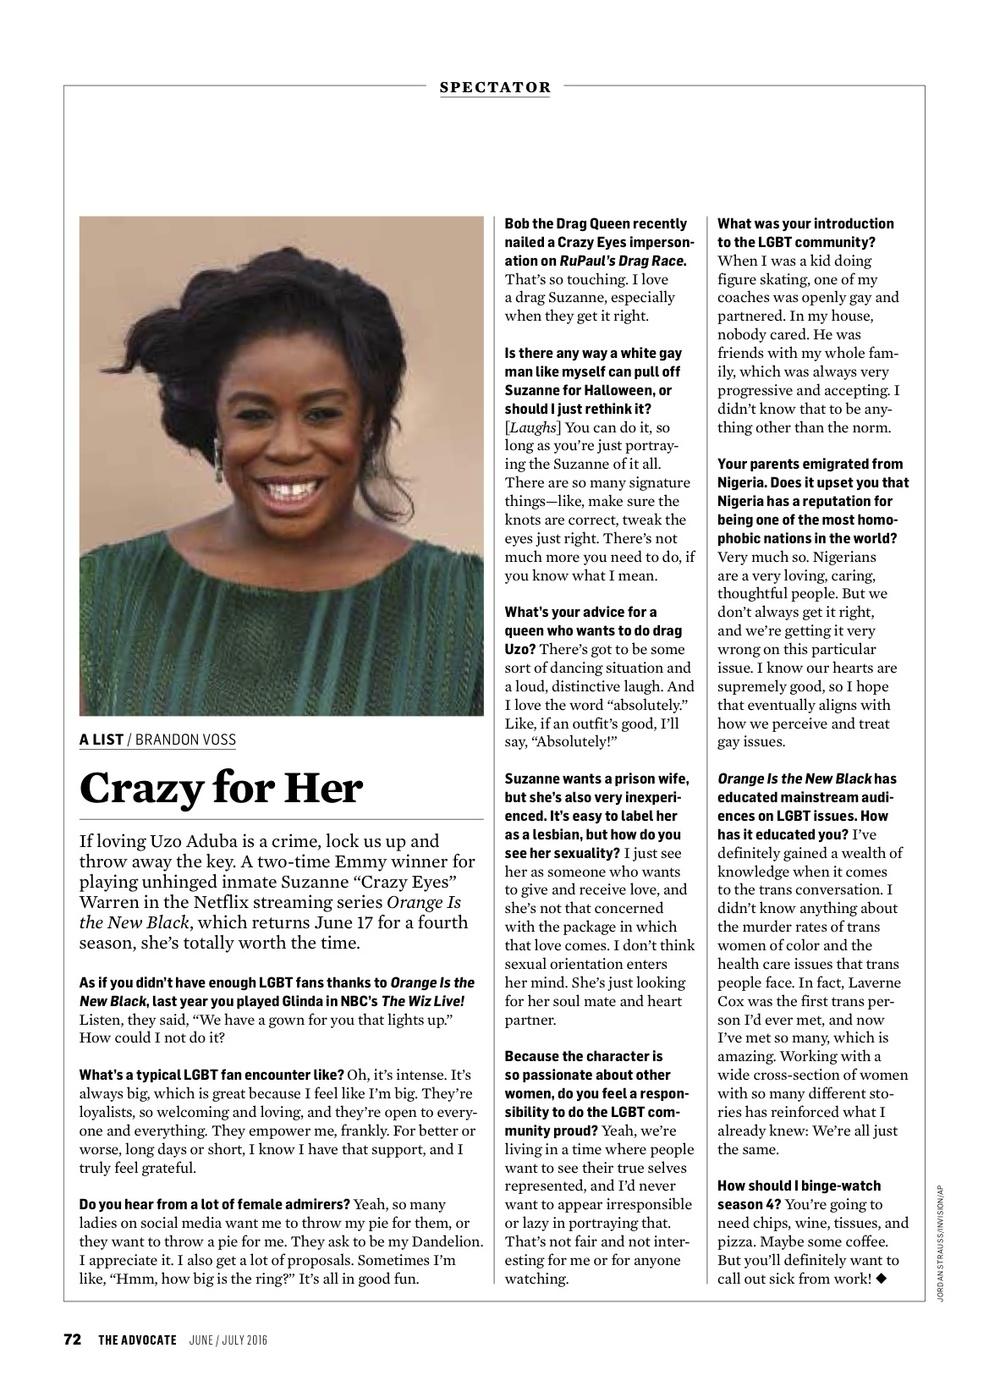 The A-List Interview-Uzo Aduba.jpg